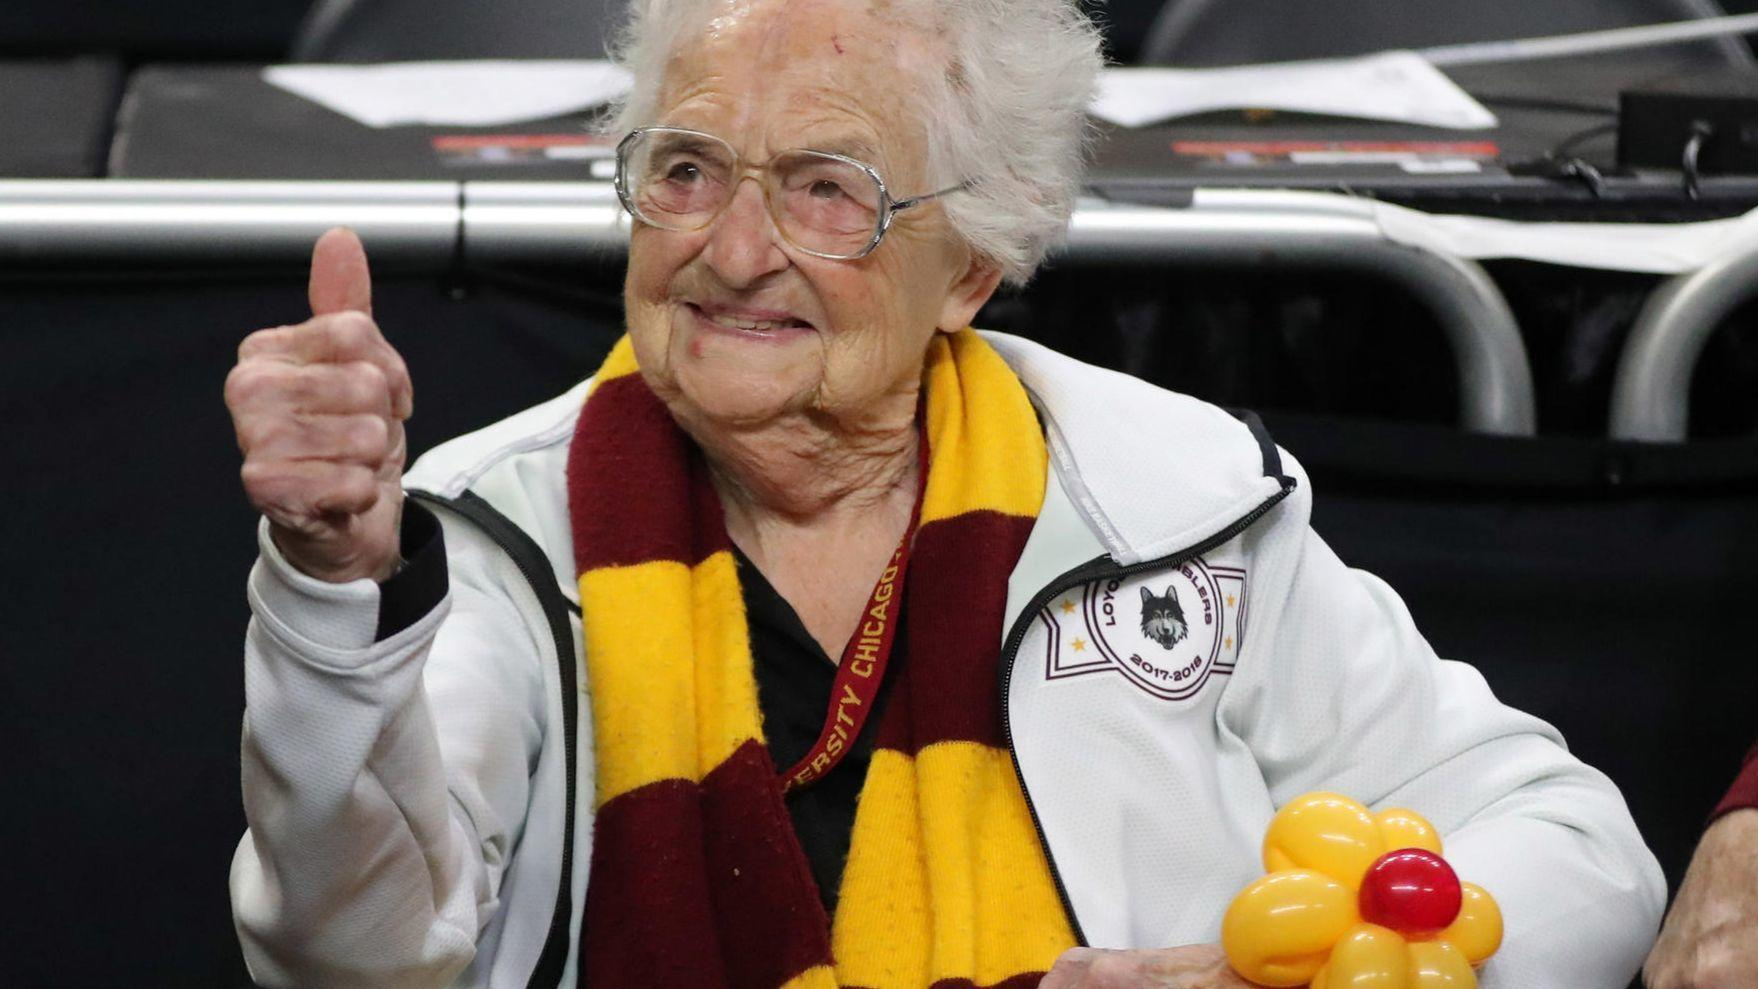 Loyola celebrity nun Sister Jean celebrating 99th birthday